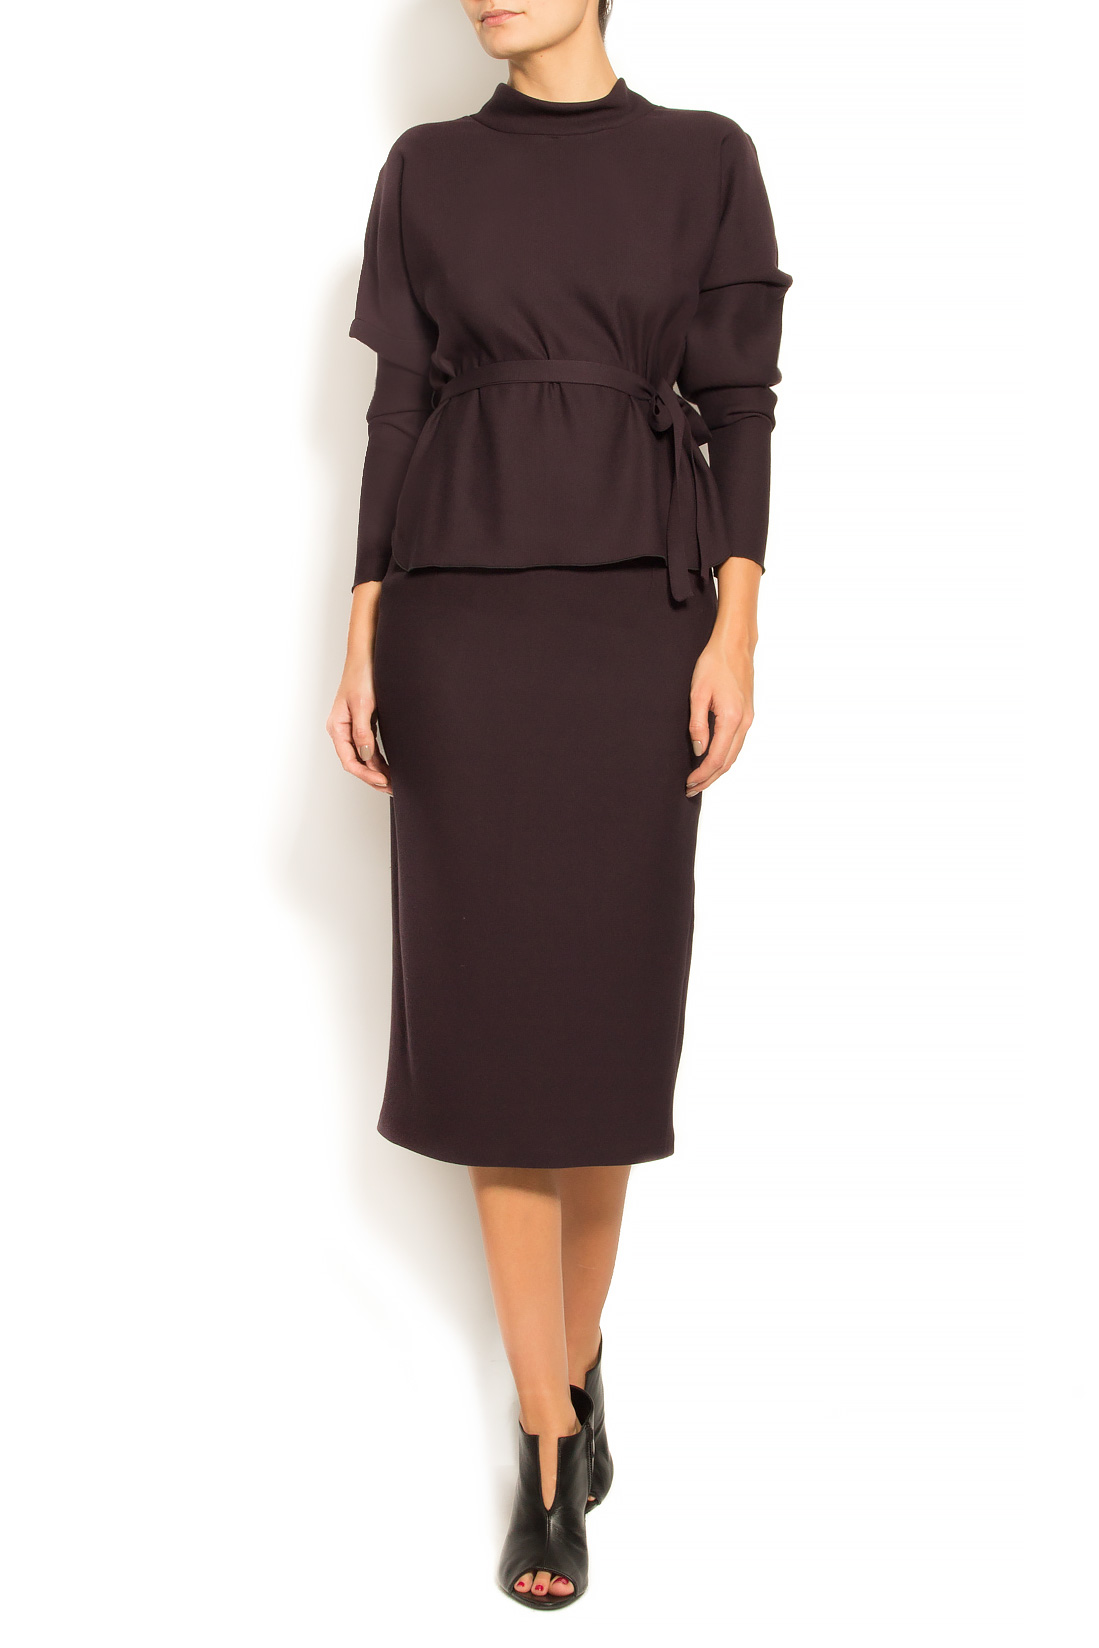 Bluza din stofa de lana si bumbac cu cordon Lena Criveanu imagine 0